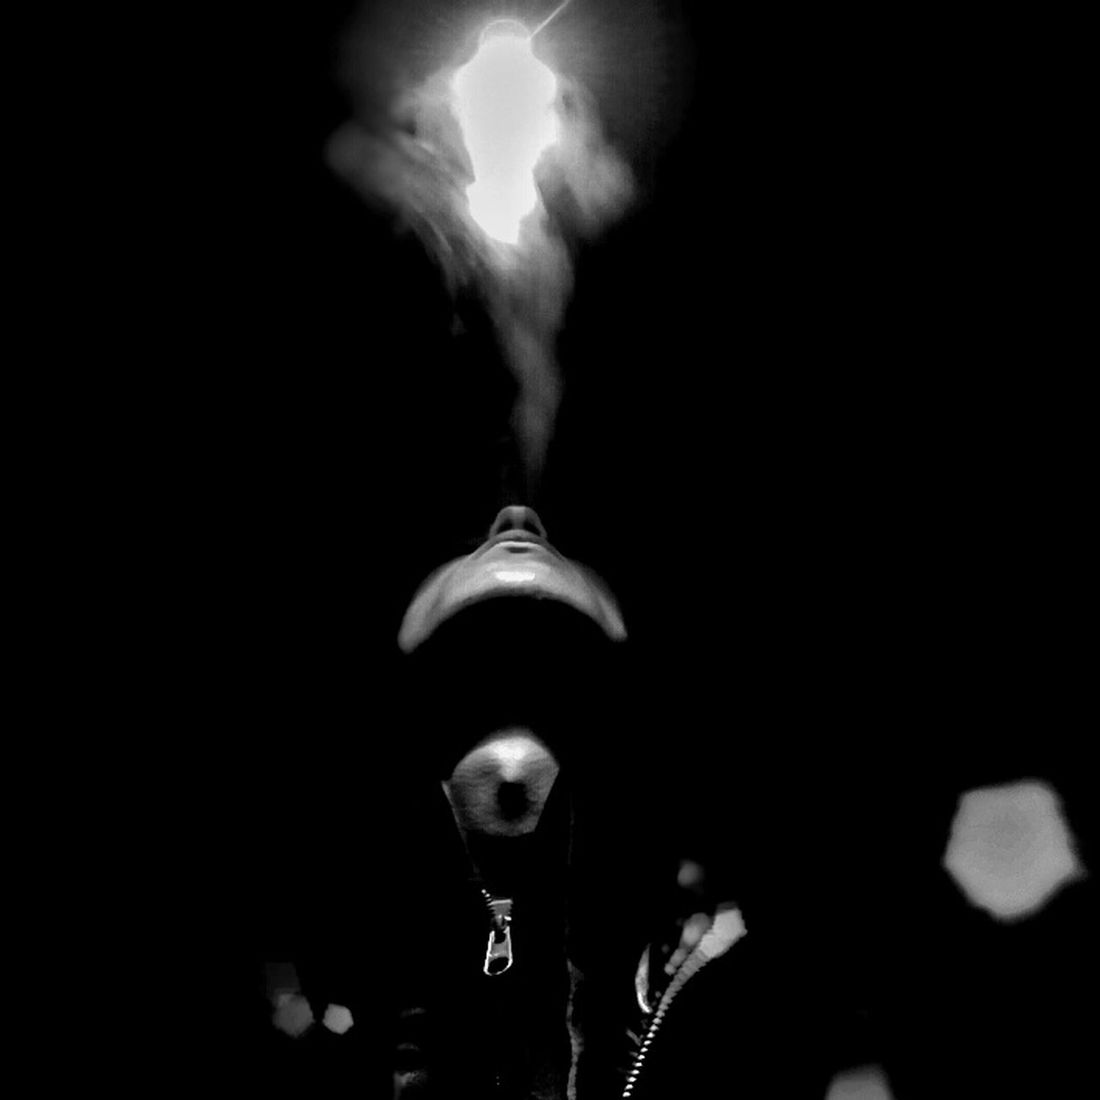 Stoner Secret Place Secretsmoke Joint Smoking  First Eyeem Photo Weed Life Weed Followme RAWPAPERS ~ Look